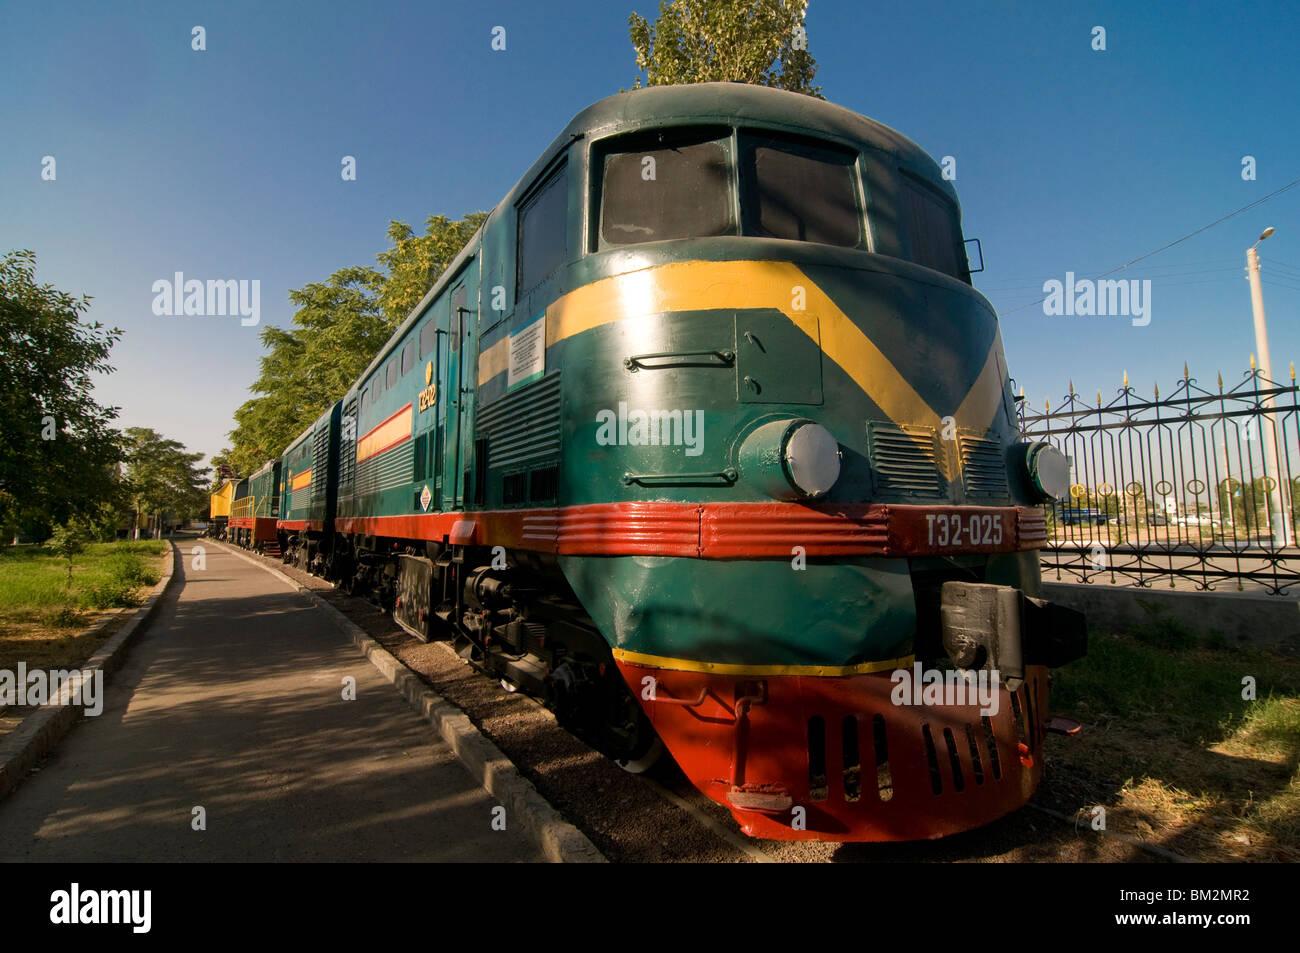 Front of an old  locomotive, Railway Museum, Tashkent, Uzbekistan Stock Photo